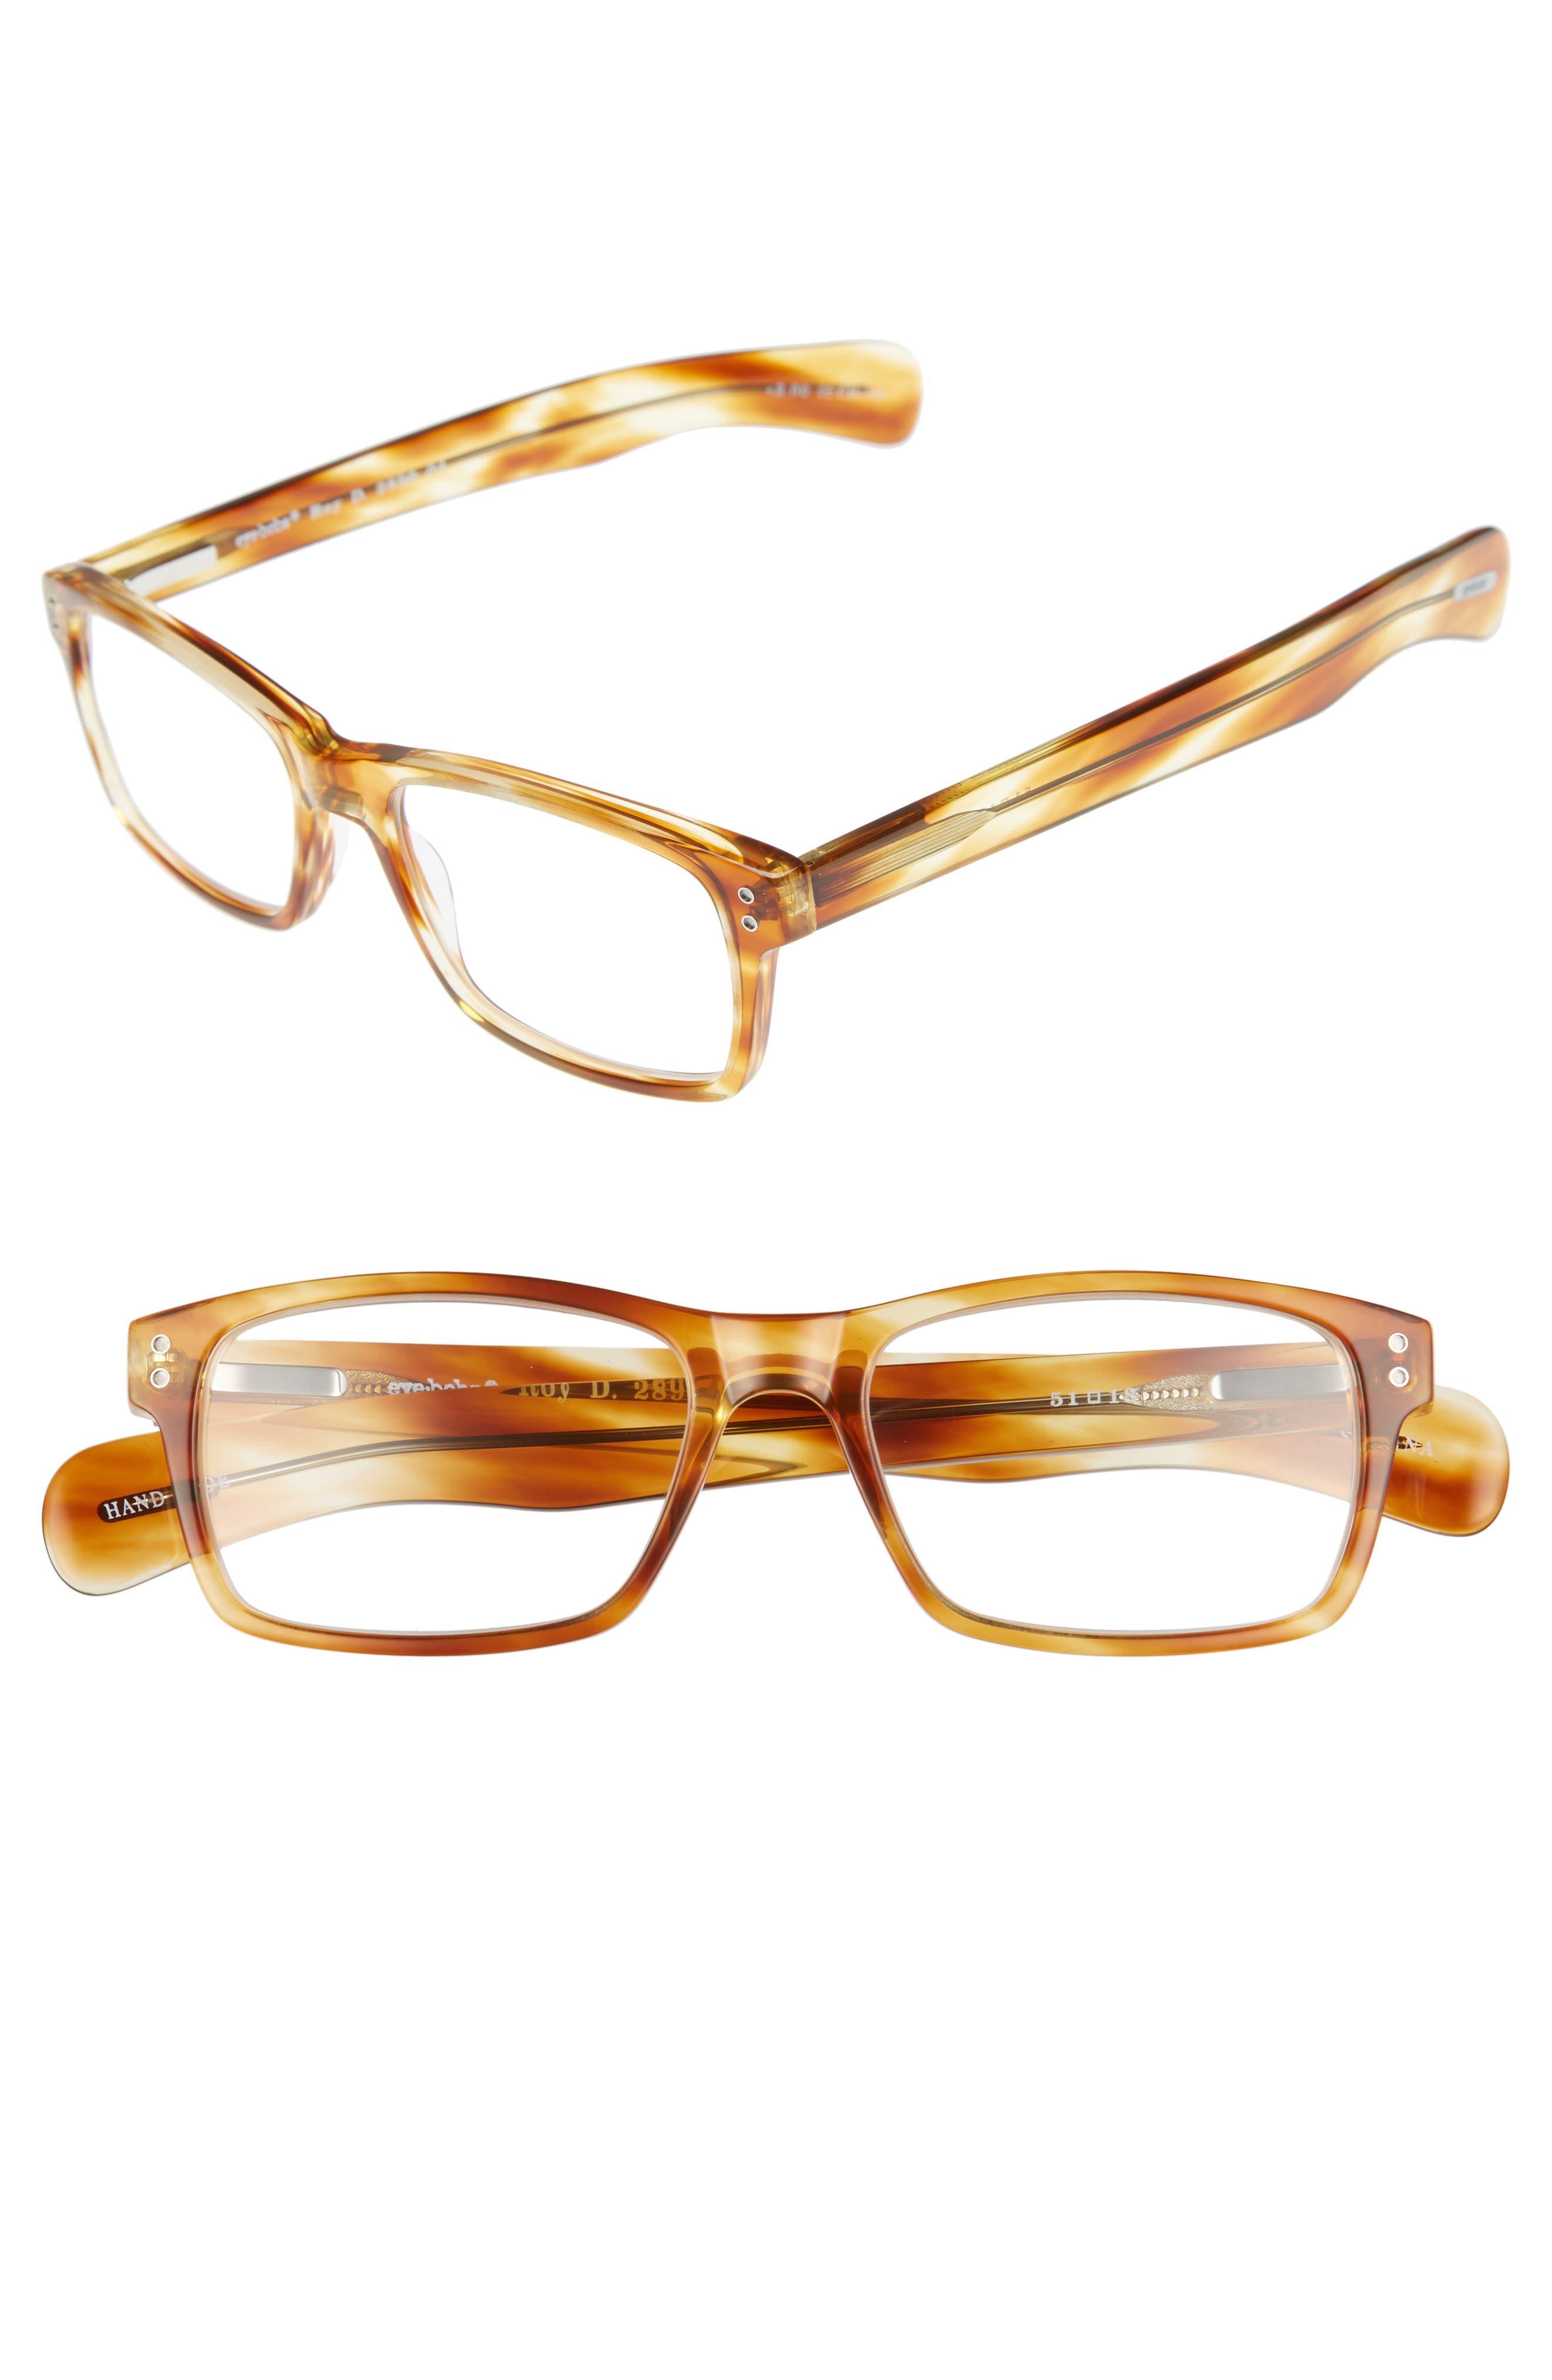 Roy D 51mm Reading Glasses,                             Main thumbnail 1, color,                             LIGHT TORTOISE